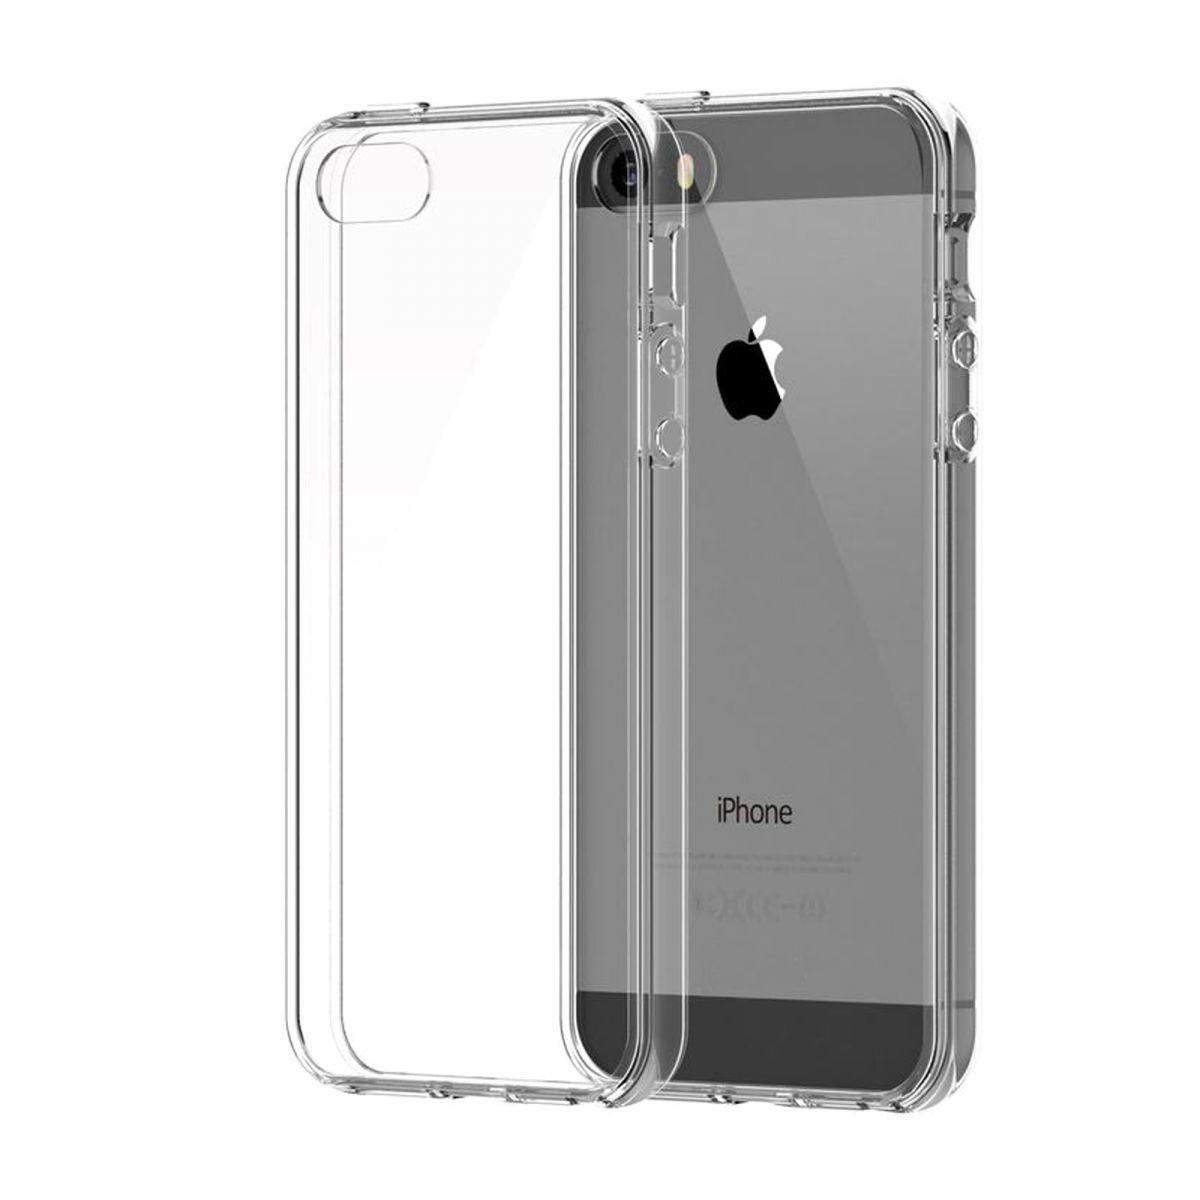 Чехол Крутотенюшка для Apple iPhone 5/5S/SE аксессуар чехол накладка innovation silicone 0 33mm для apple iphone 5 5s transparent 12001